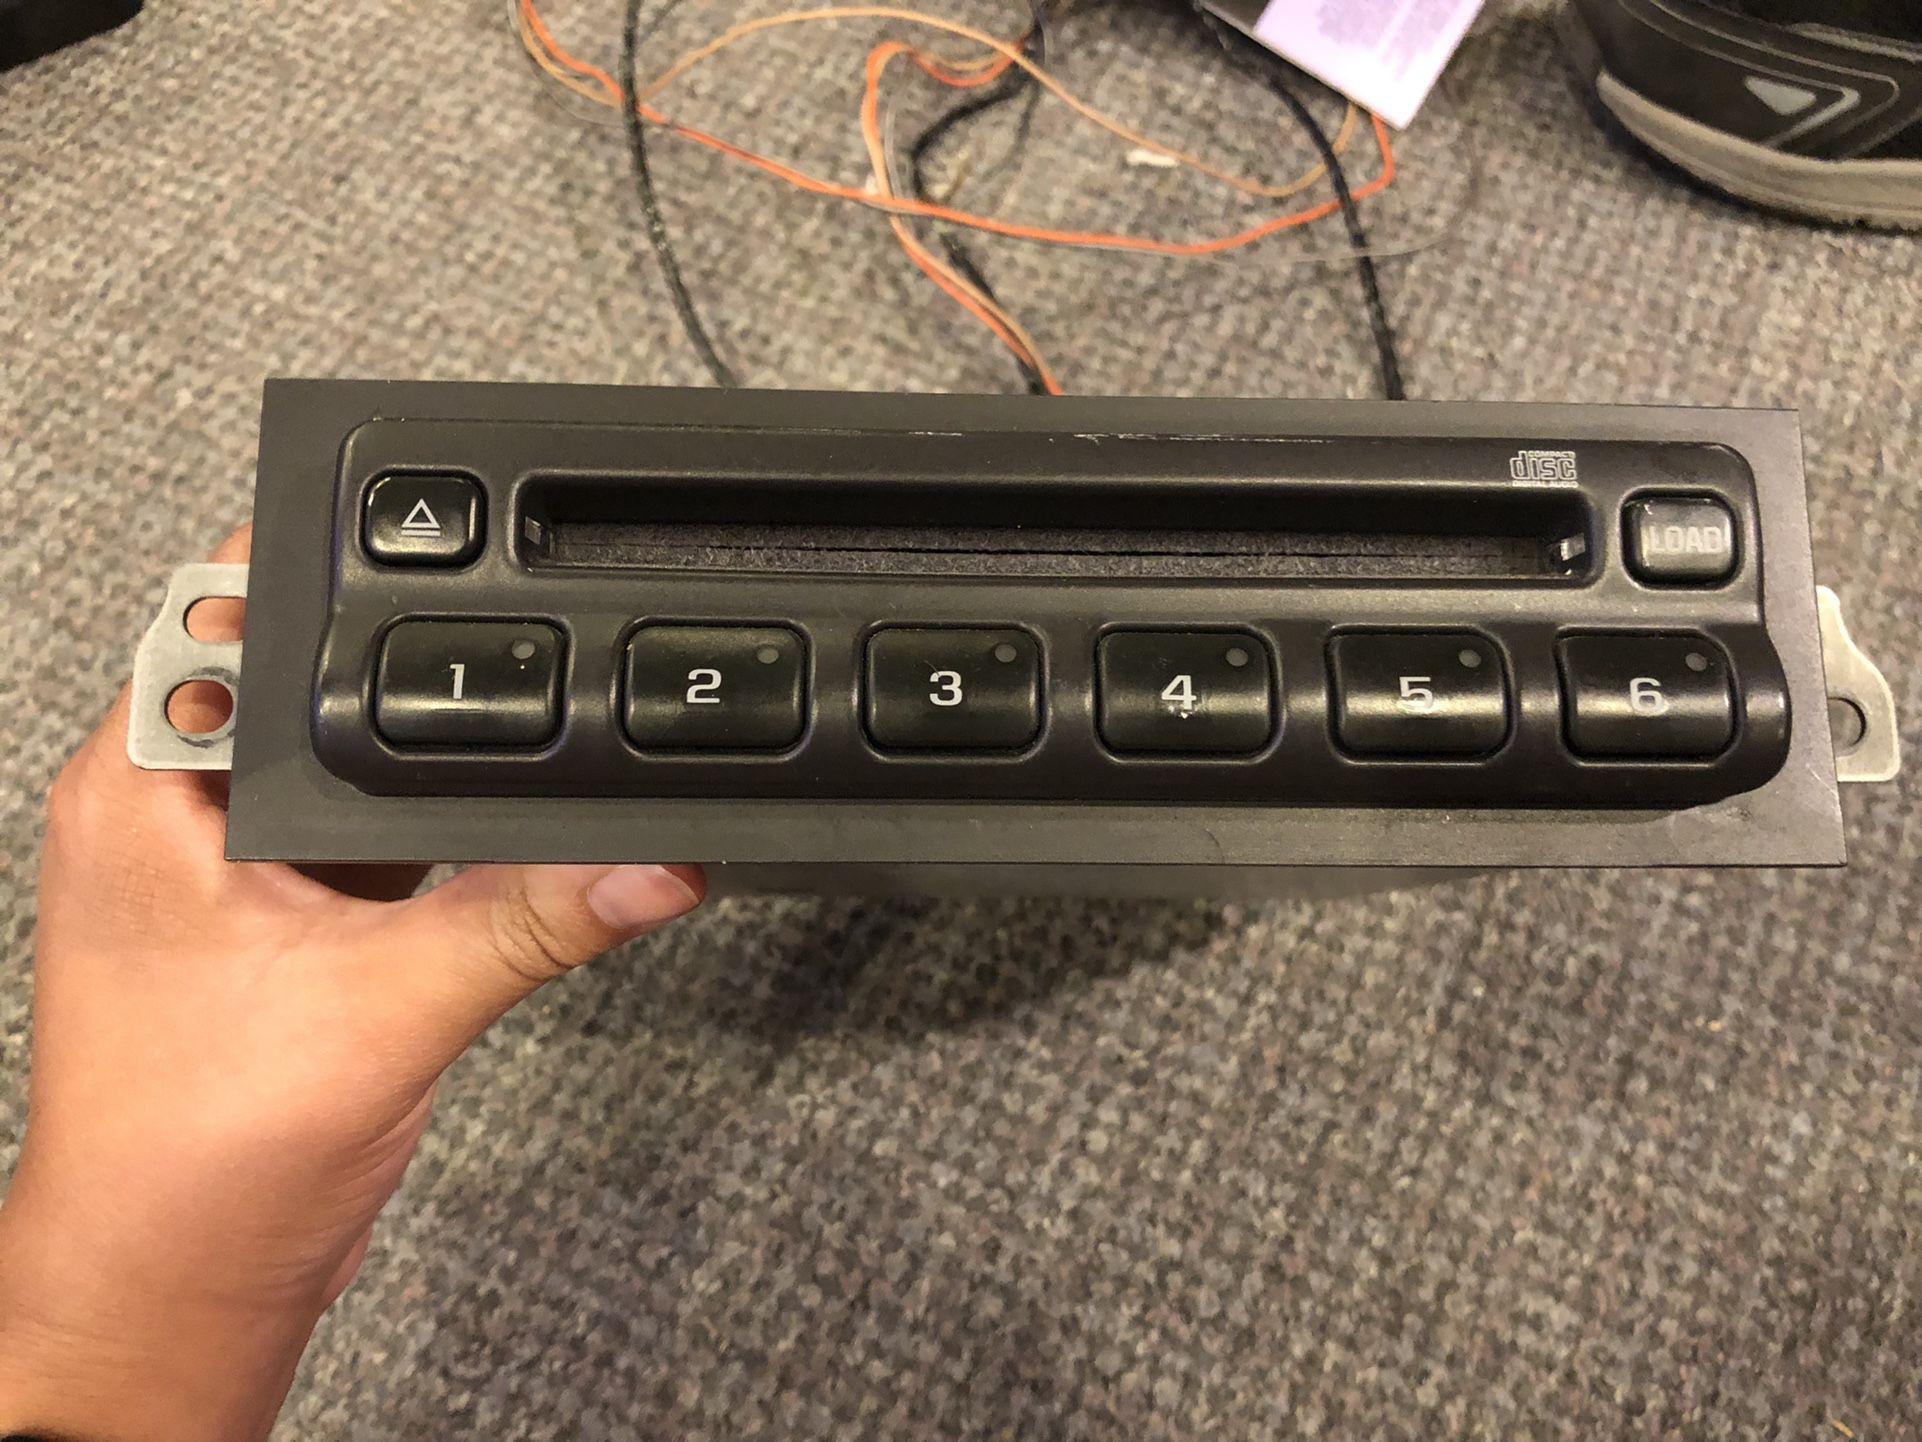 6 DISC CD Player Changer Panasonic 15110393